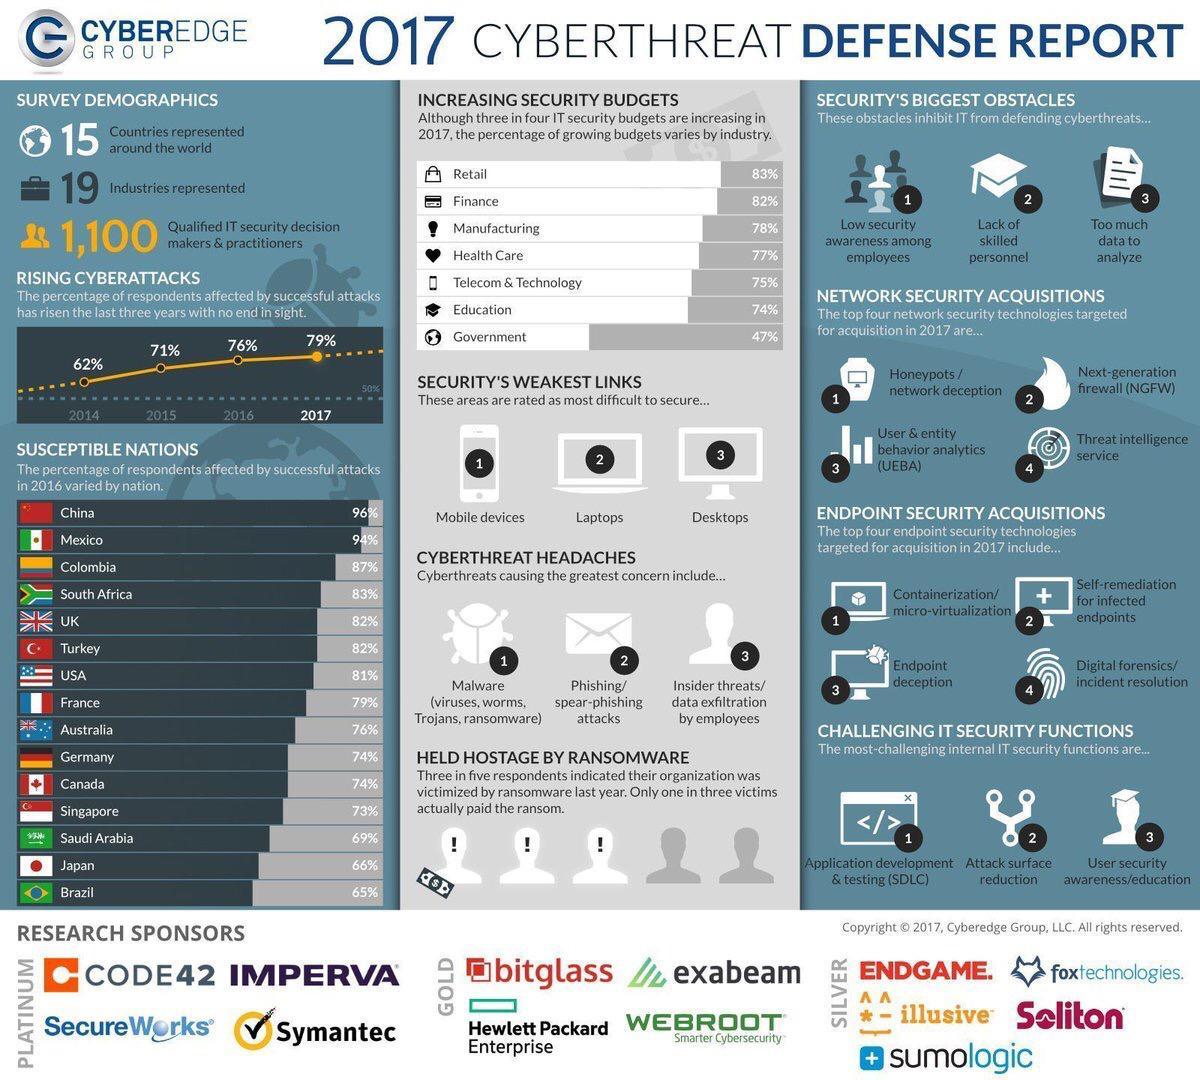 CyberEdge_2017_Threat_Report.jpeg